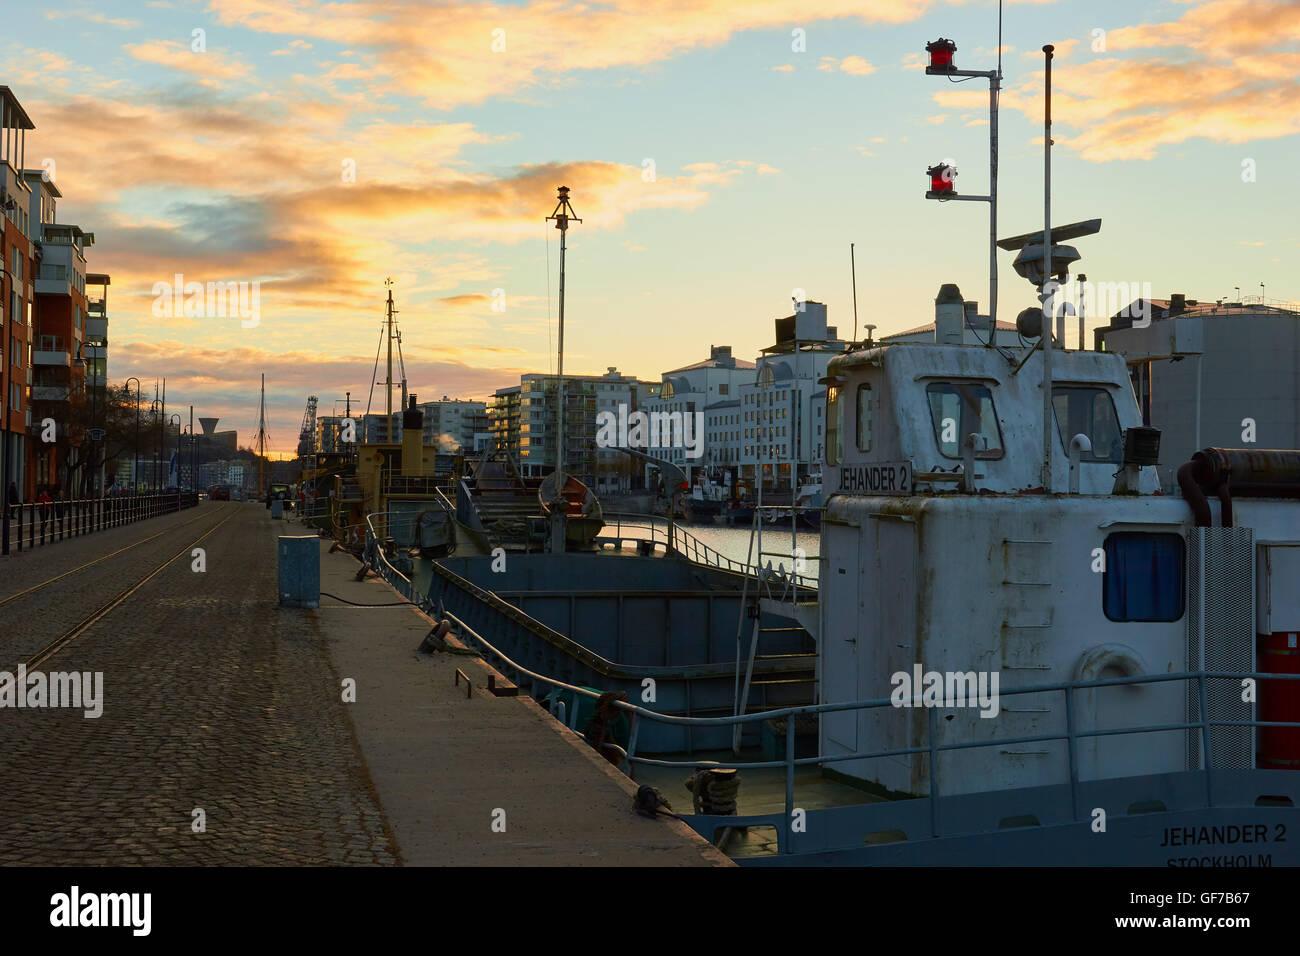 Boats moored at Hammarby Sjostad an eco neighbourhood Stockholm, Sweden, Scandinavia - Stock Image